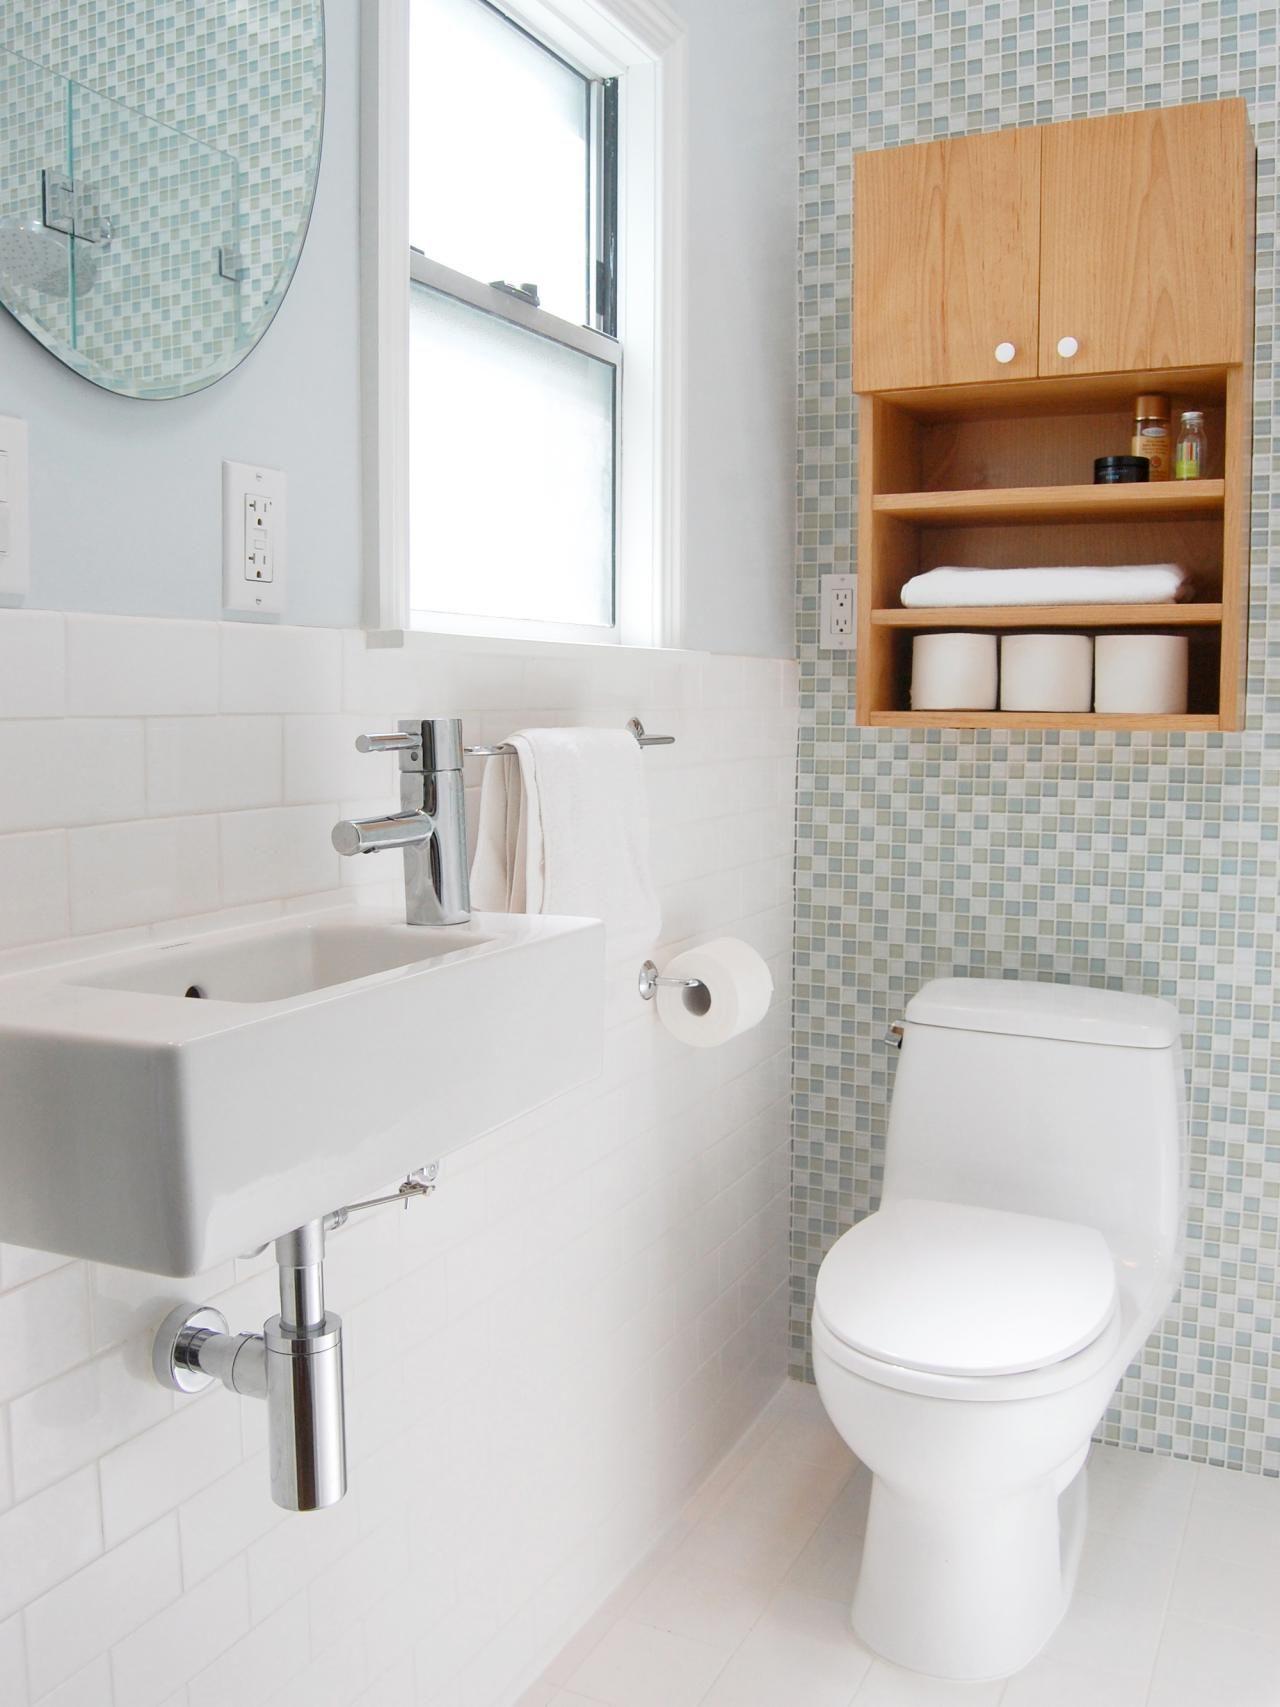 Small Bathroom Decorating Ideas   Hgtv, Small bathroom and ...